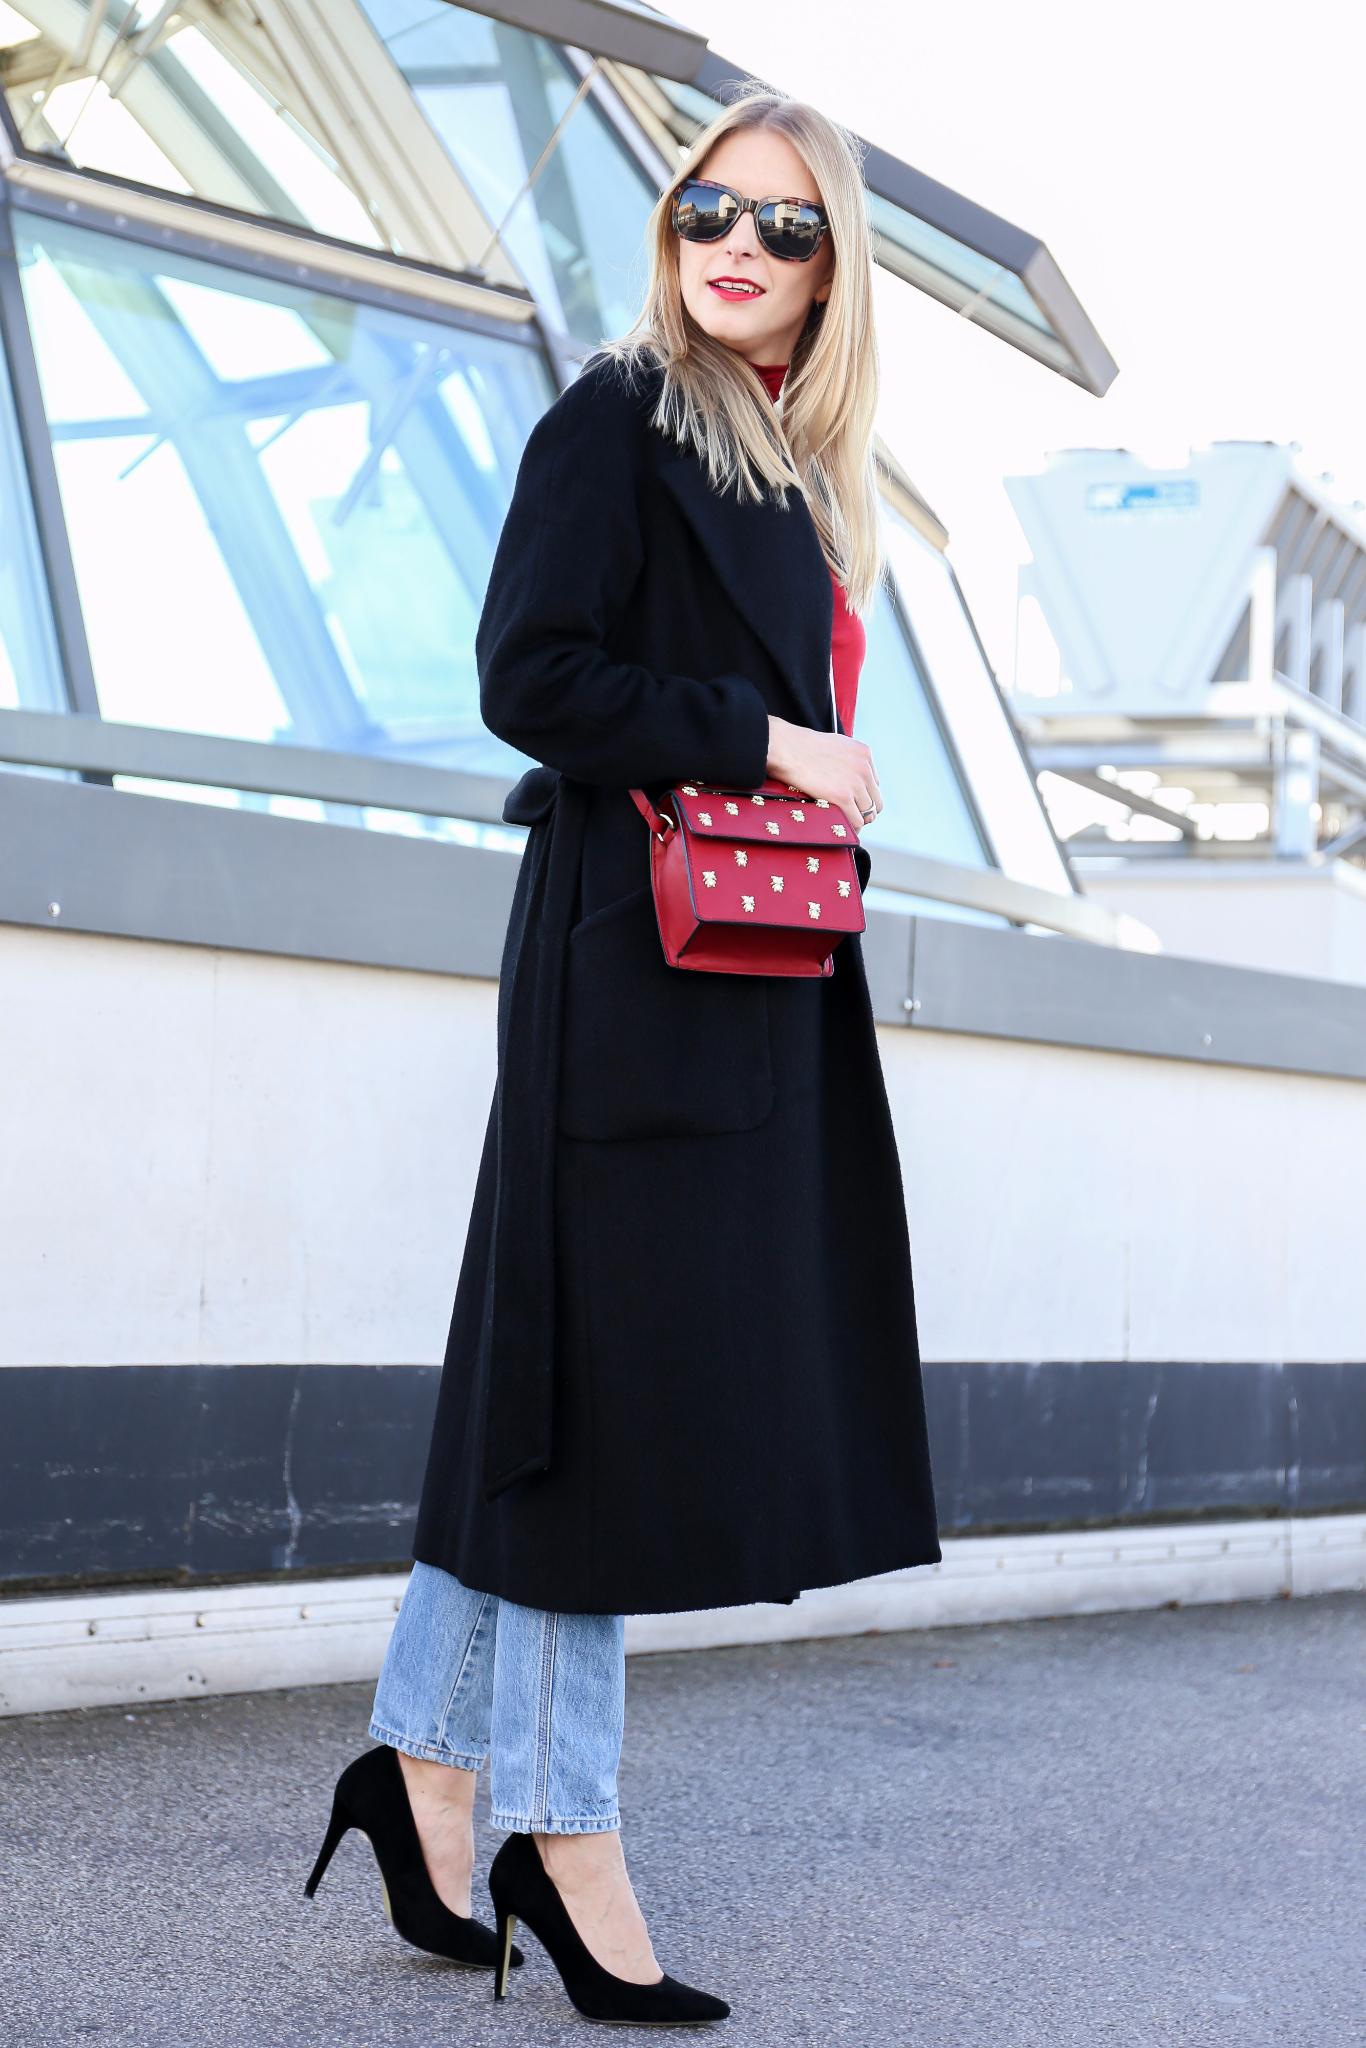 MOD-by-Monique-Fashion-Looks-Closed-Tiny-Beetle-Bag-15